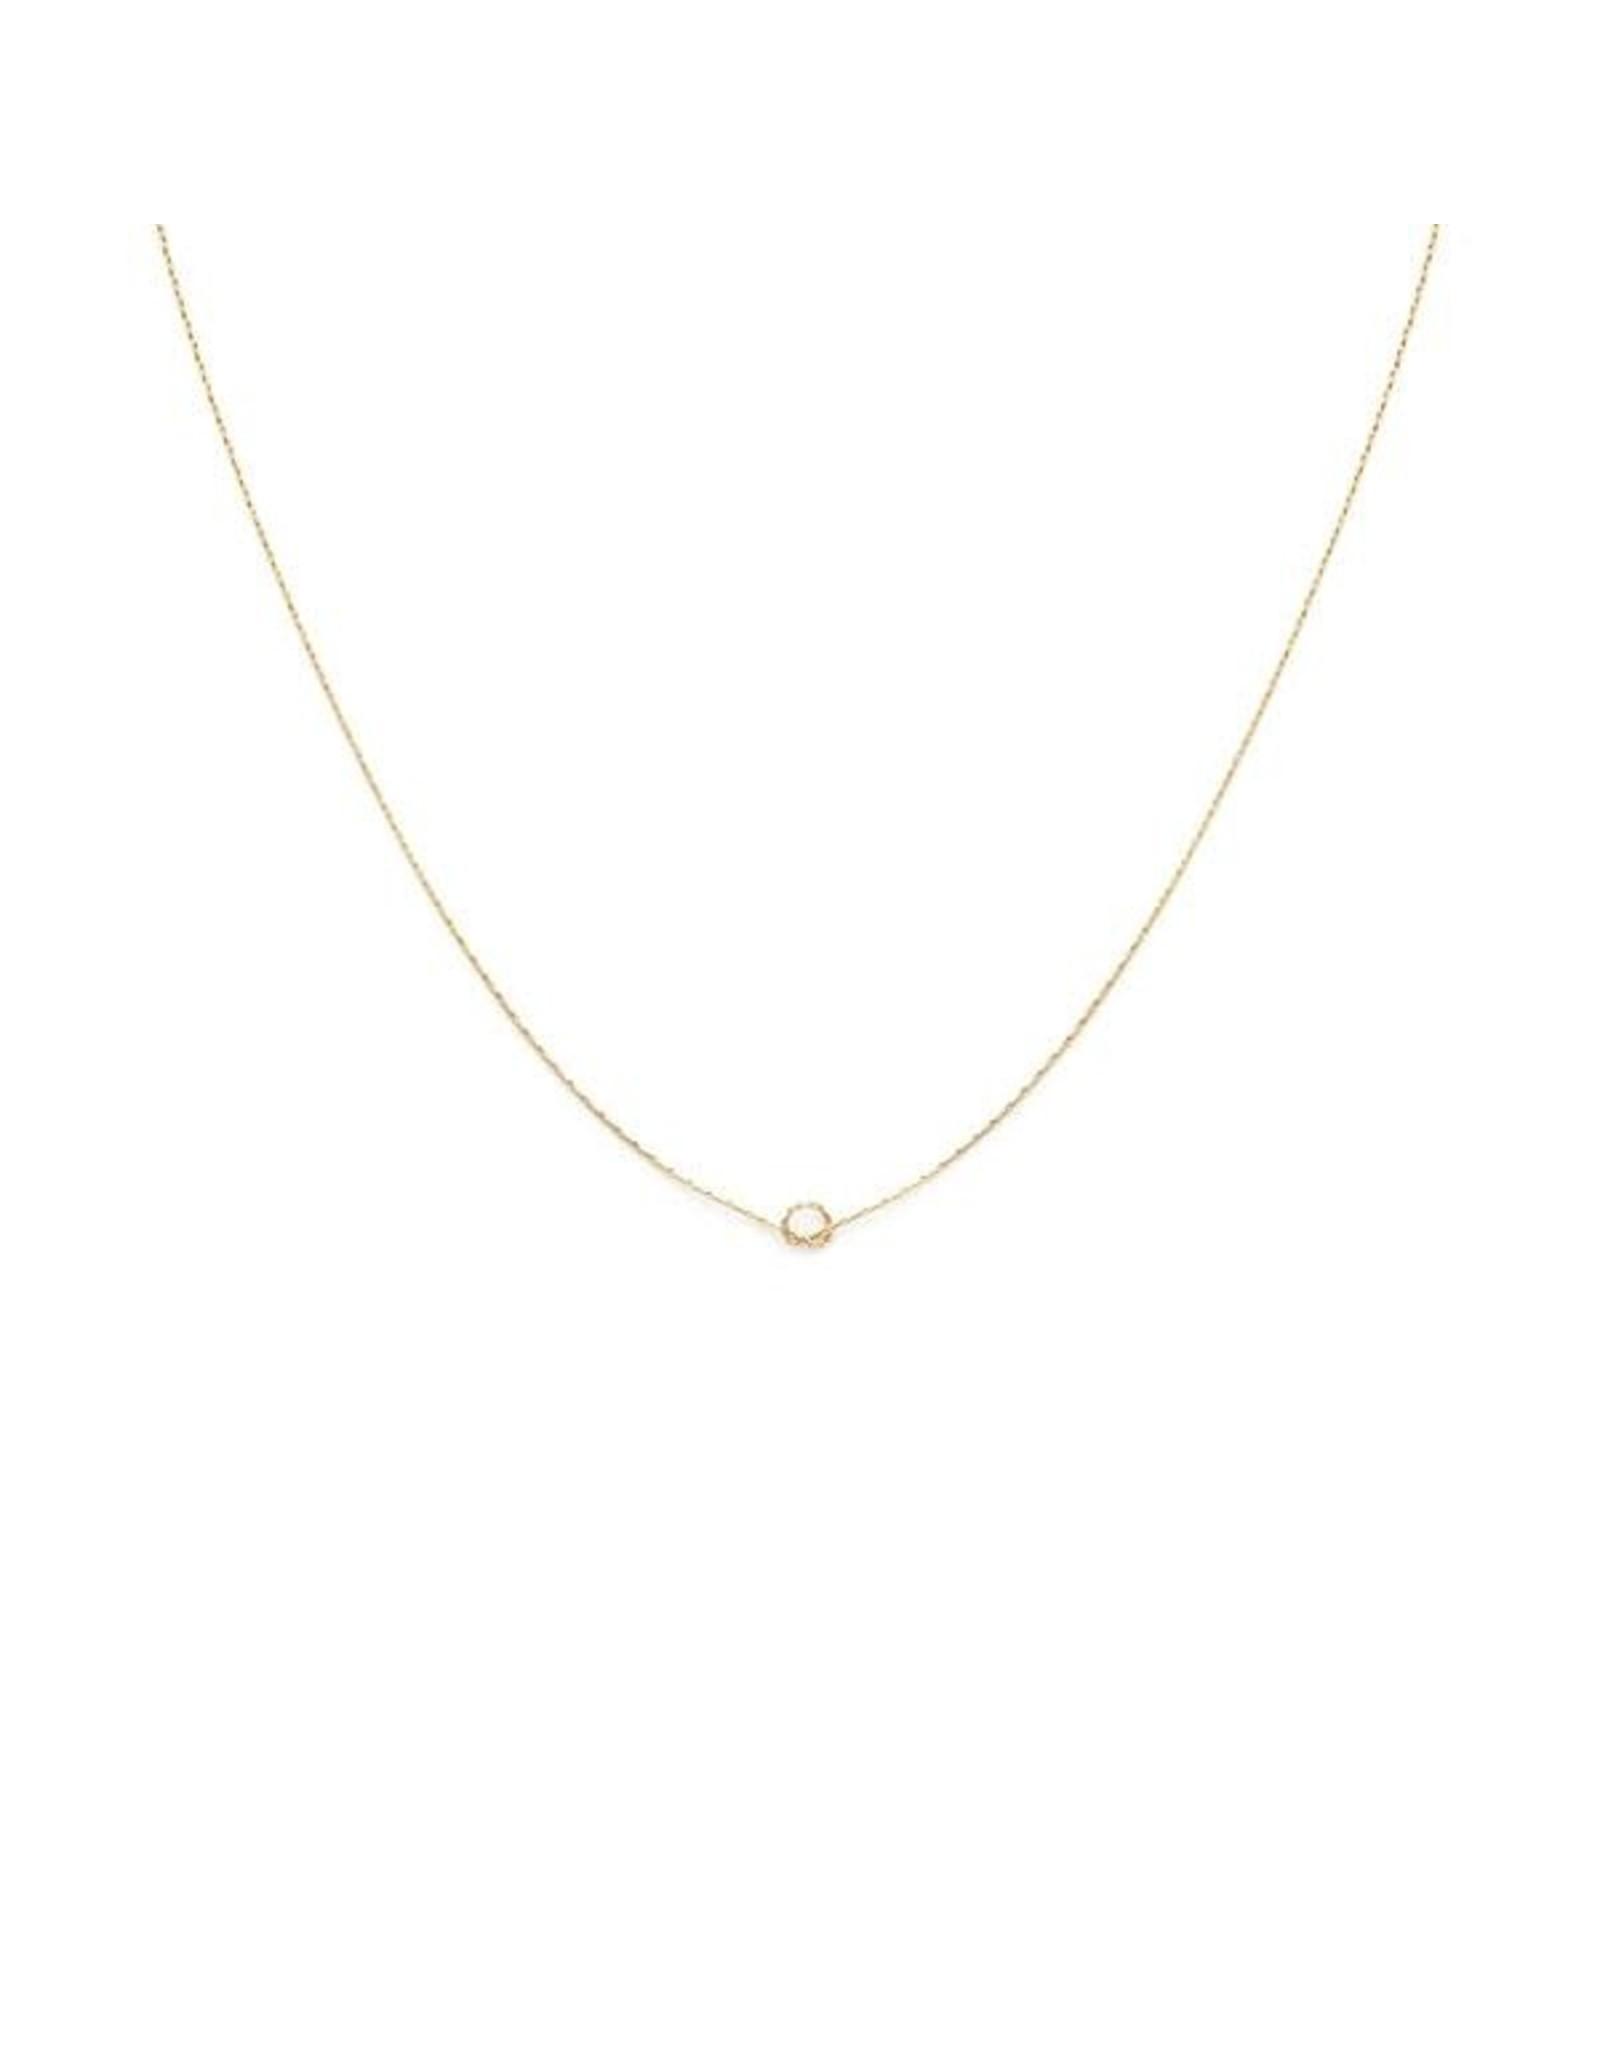 leah alexandra Knot Necklace   Goldfill